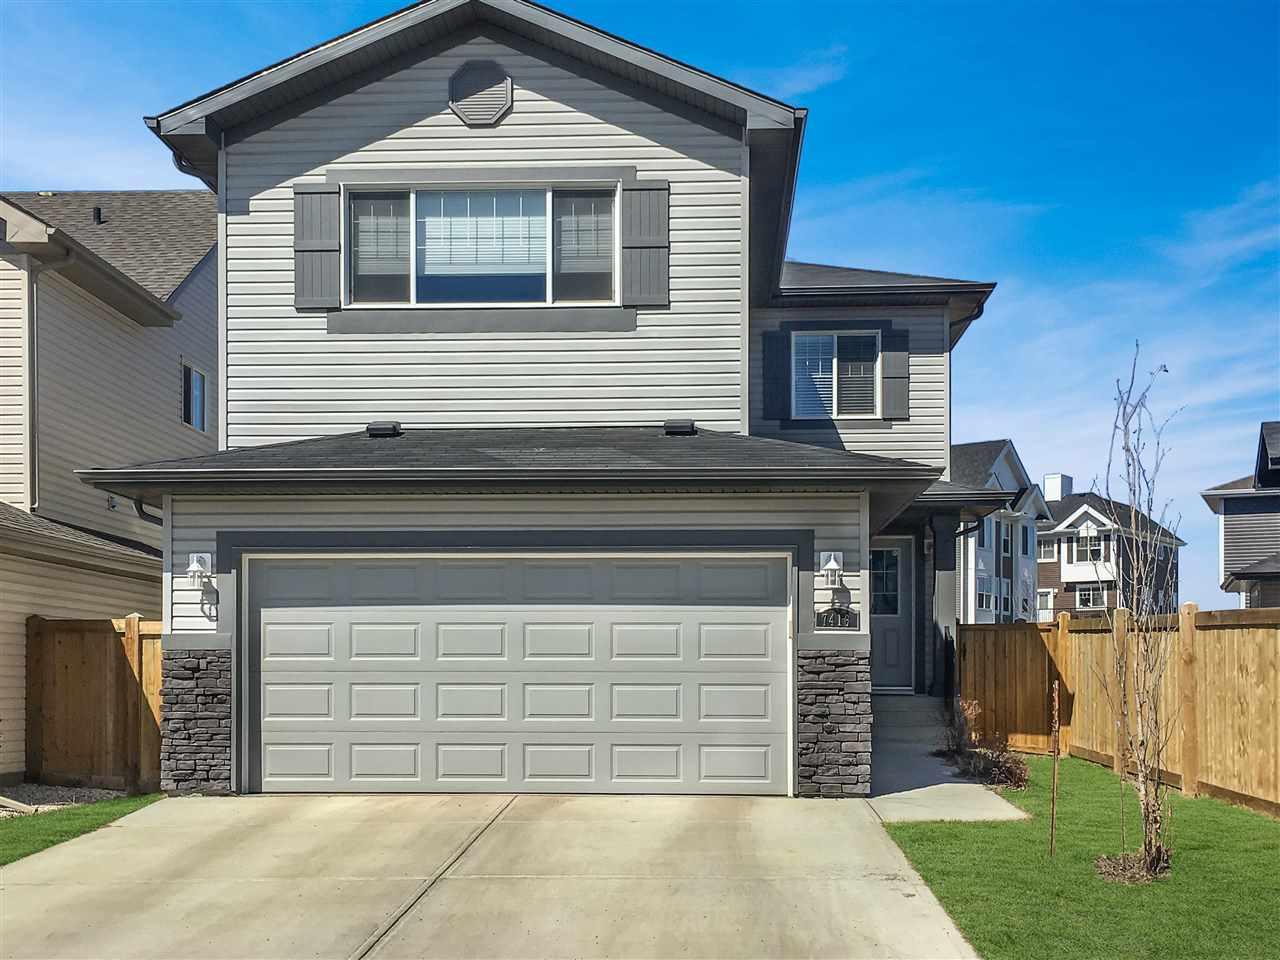 For Sale: 7416 179 Avenue, Edmonton, AB   3 Bed, 2 Bath House for $489,000. See 24 photos!